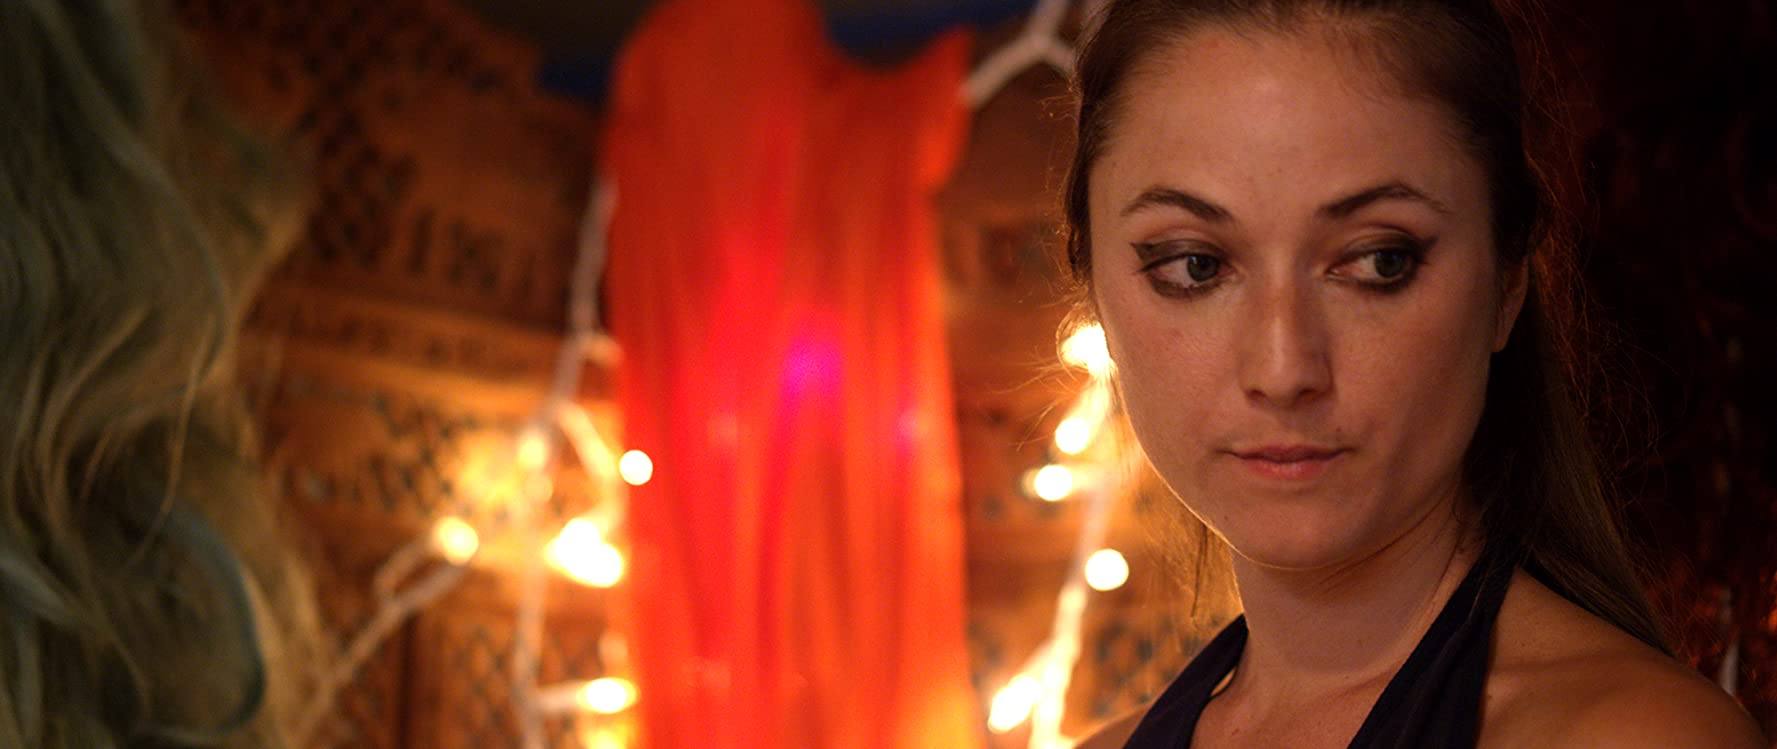 Sofia Carson,Caitlin Blackwood (born 2000) Adult fotos Joan Orenstein,Klariza Clayton (born 1989)